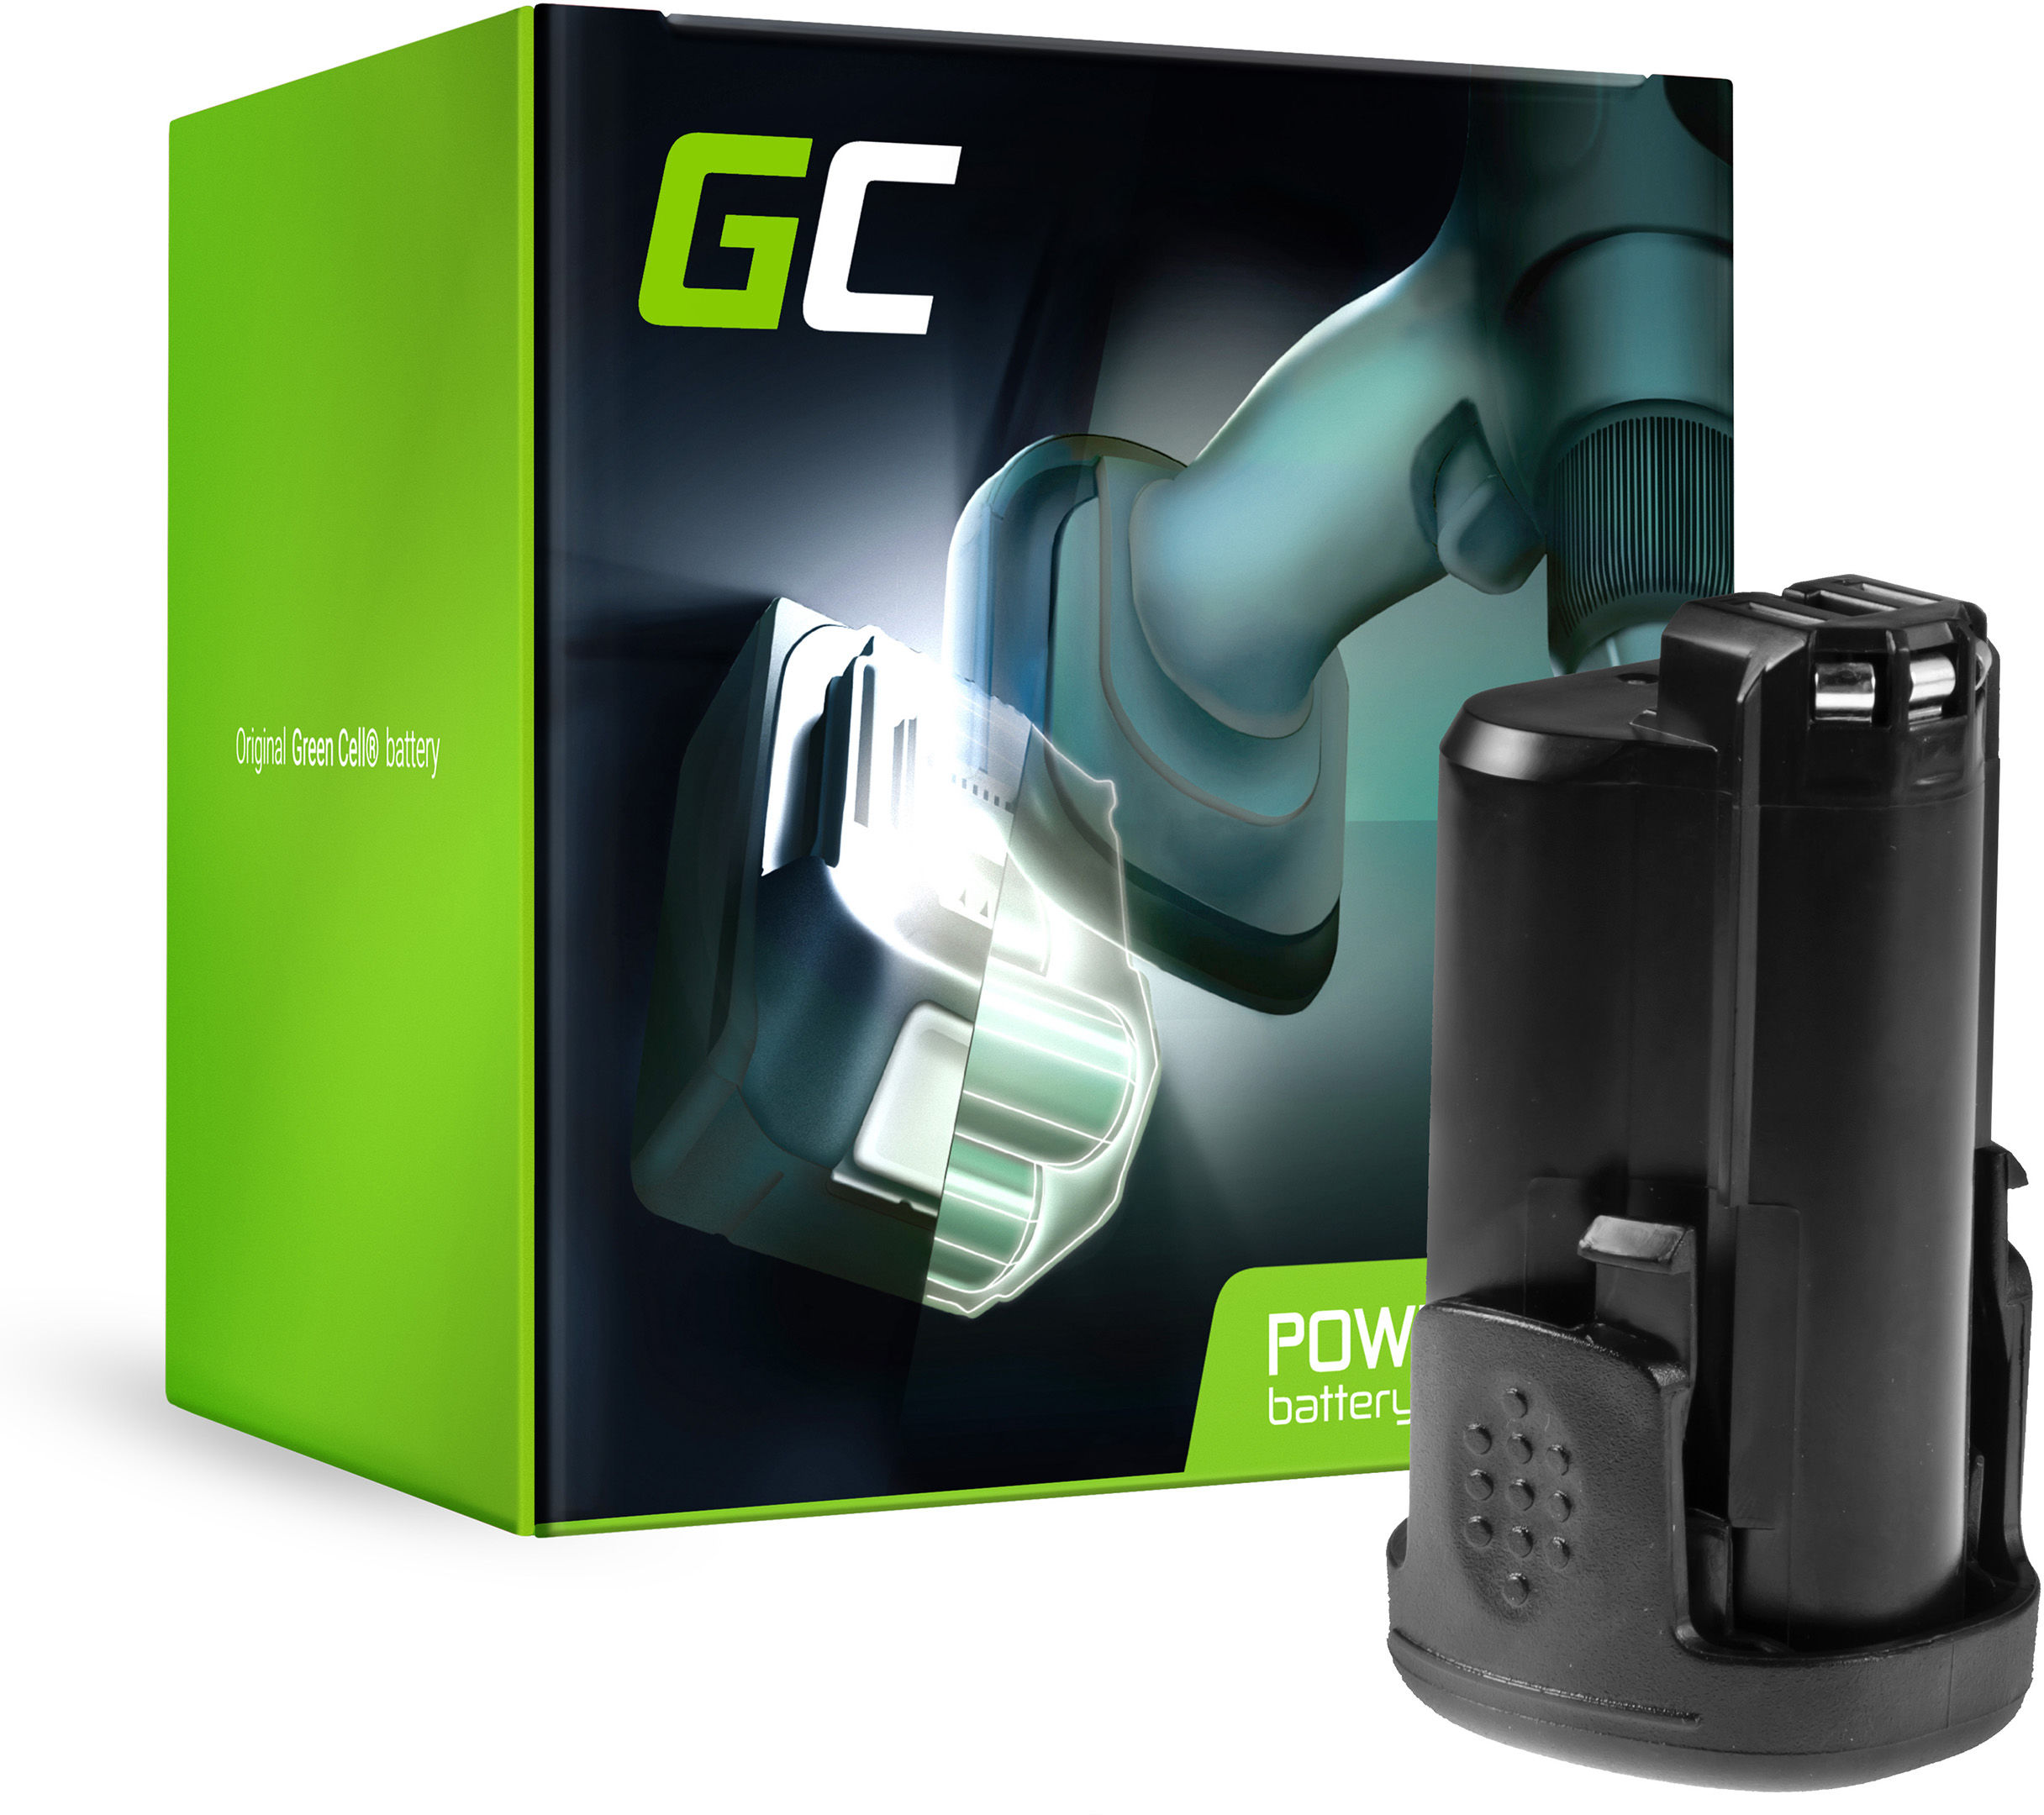 Bateria Green Cell (1.5Ah 10.8V) Power4All PBA 12 PBA 10.8 do Bosch 12 AHS ART PSB PMF PSM 10.8 LI-2 Dremel 8200 8300 Multi Max